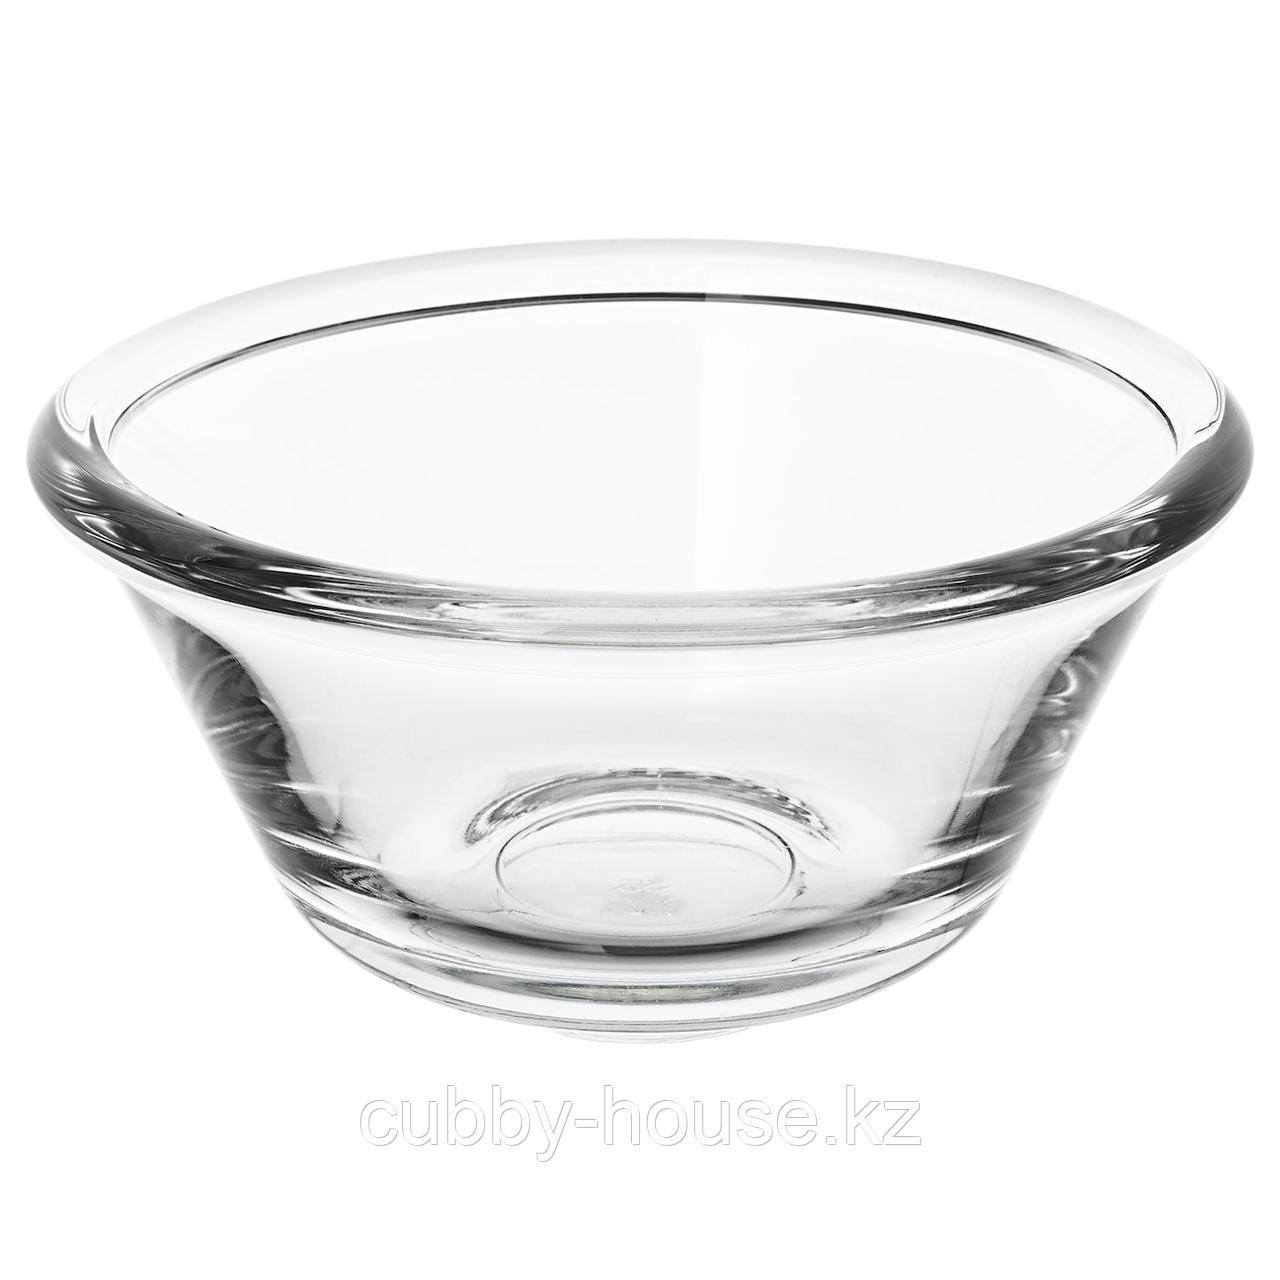 ВАРДАГЕН Миска, прозрачное стекло, 15 см